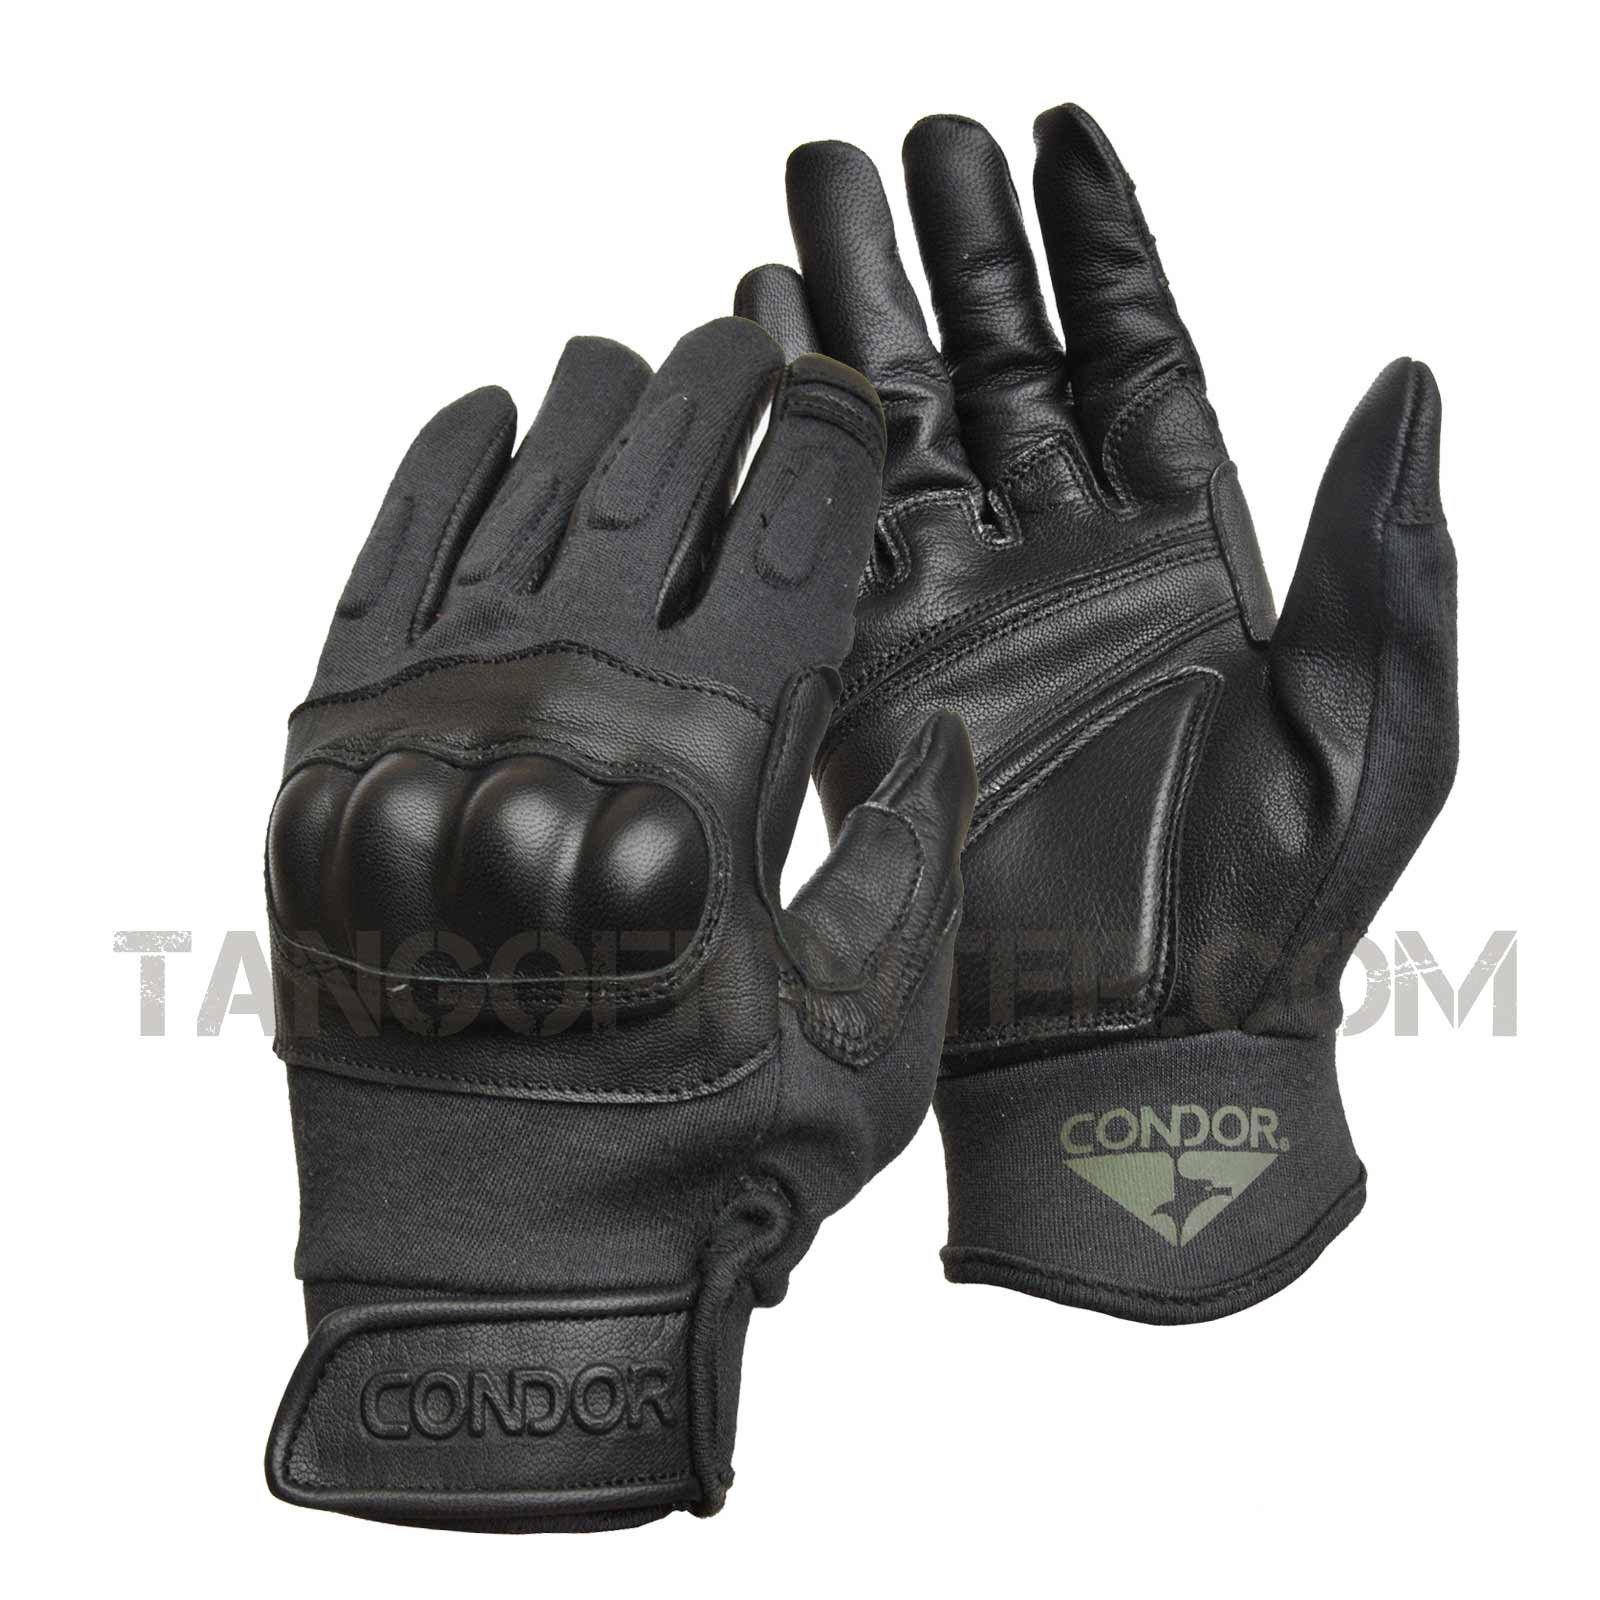 Xxl black leather gloves - Responsive Image